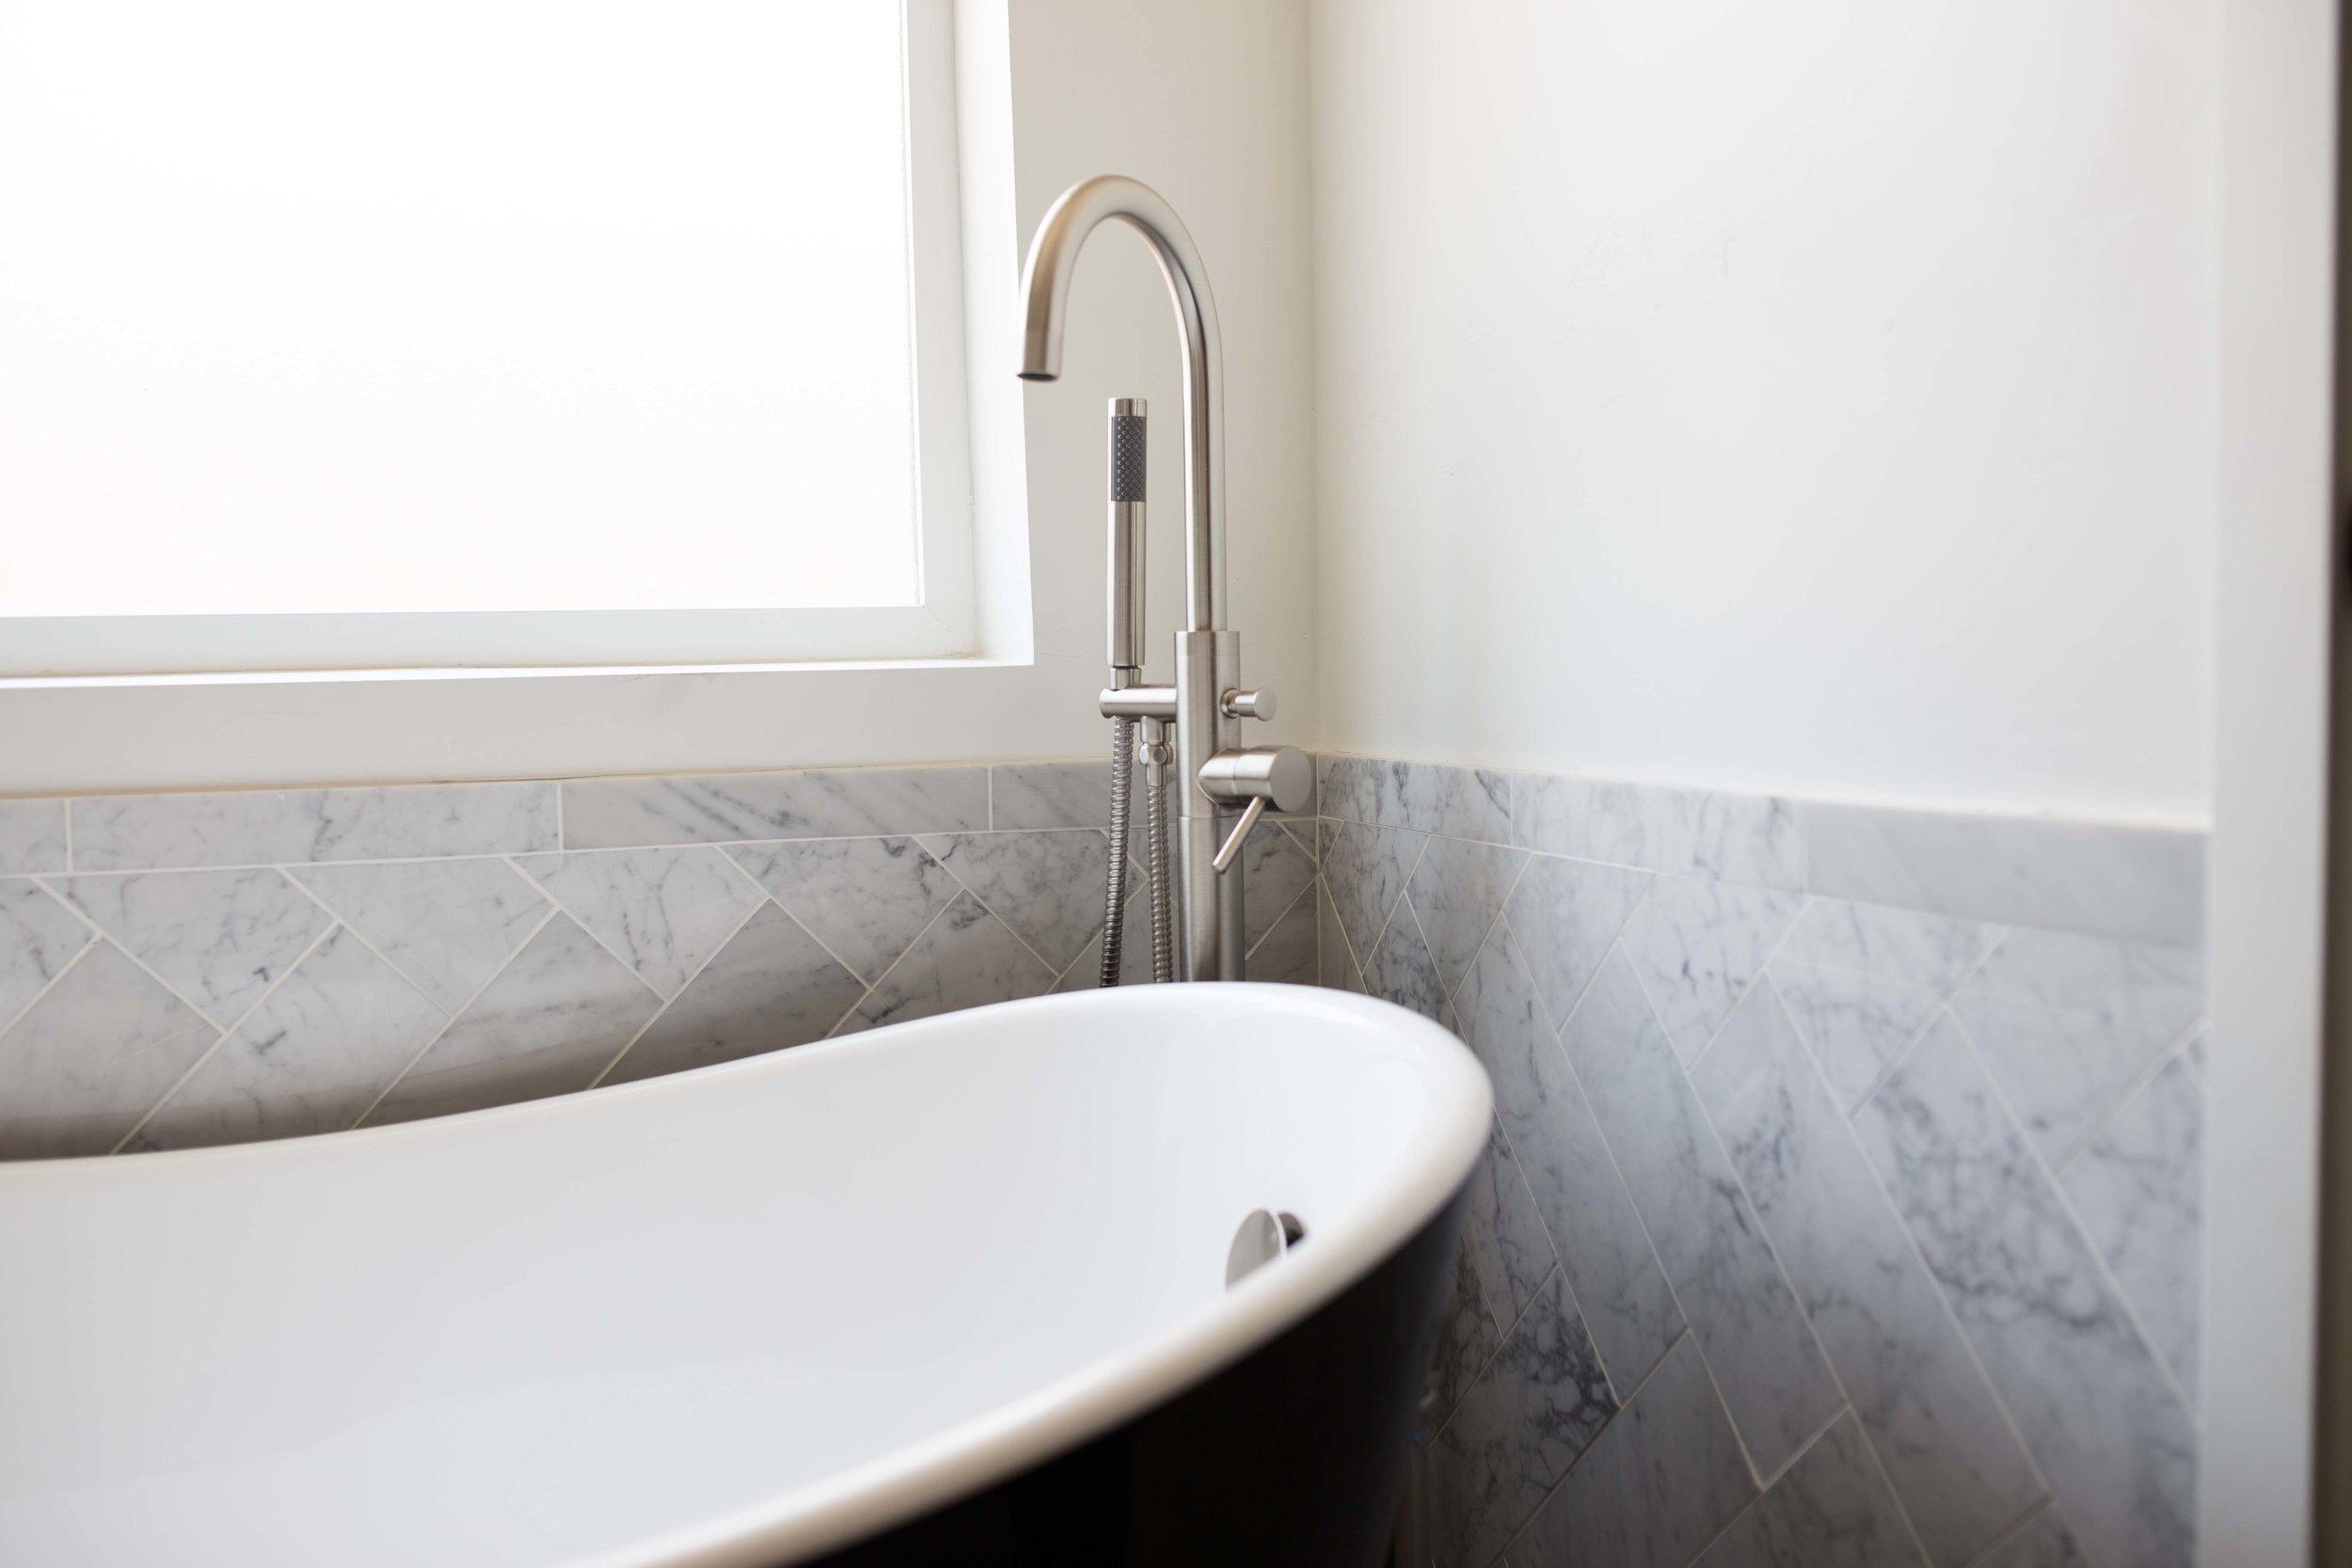 Signature Hardware soaking tub and tub filler faucet